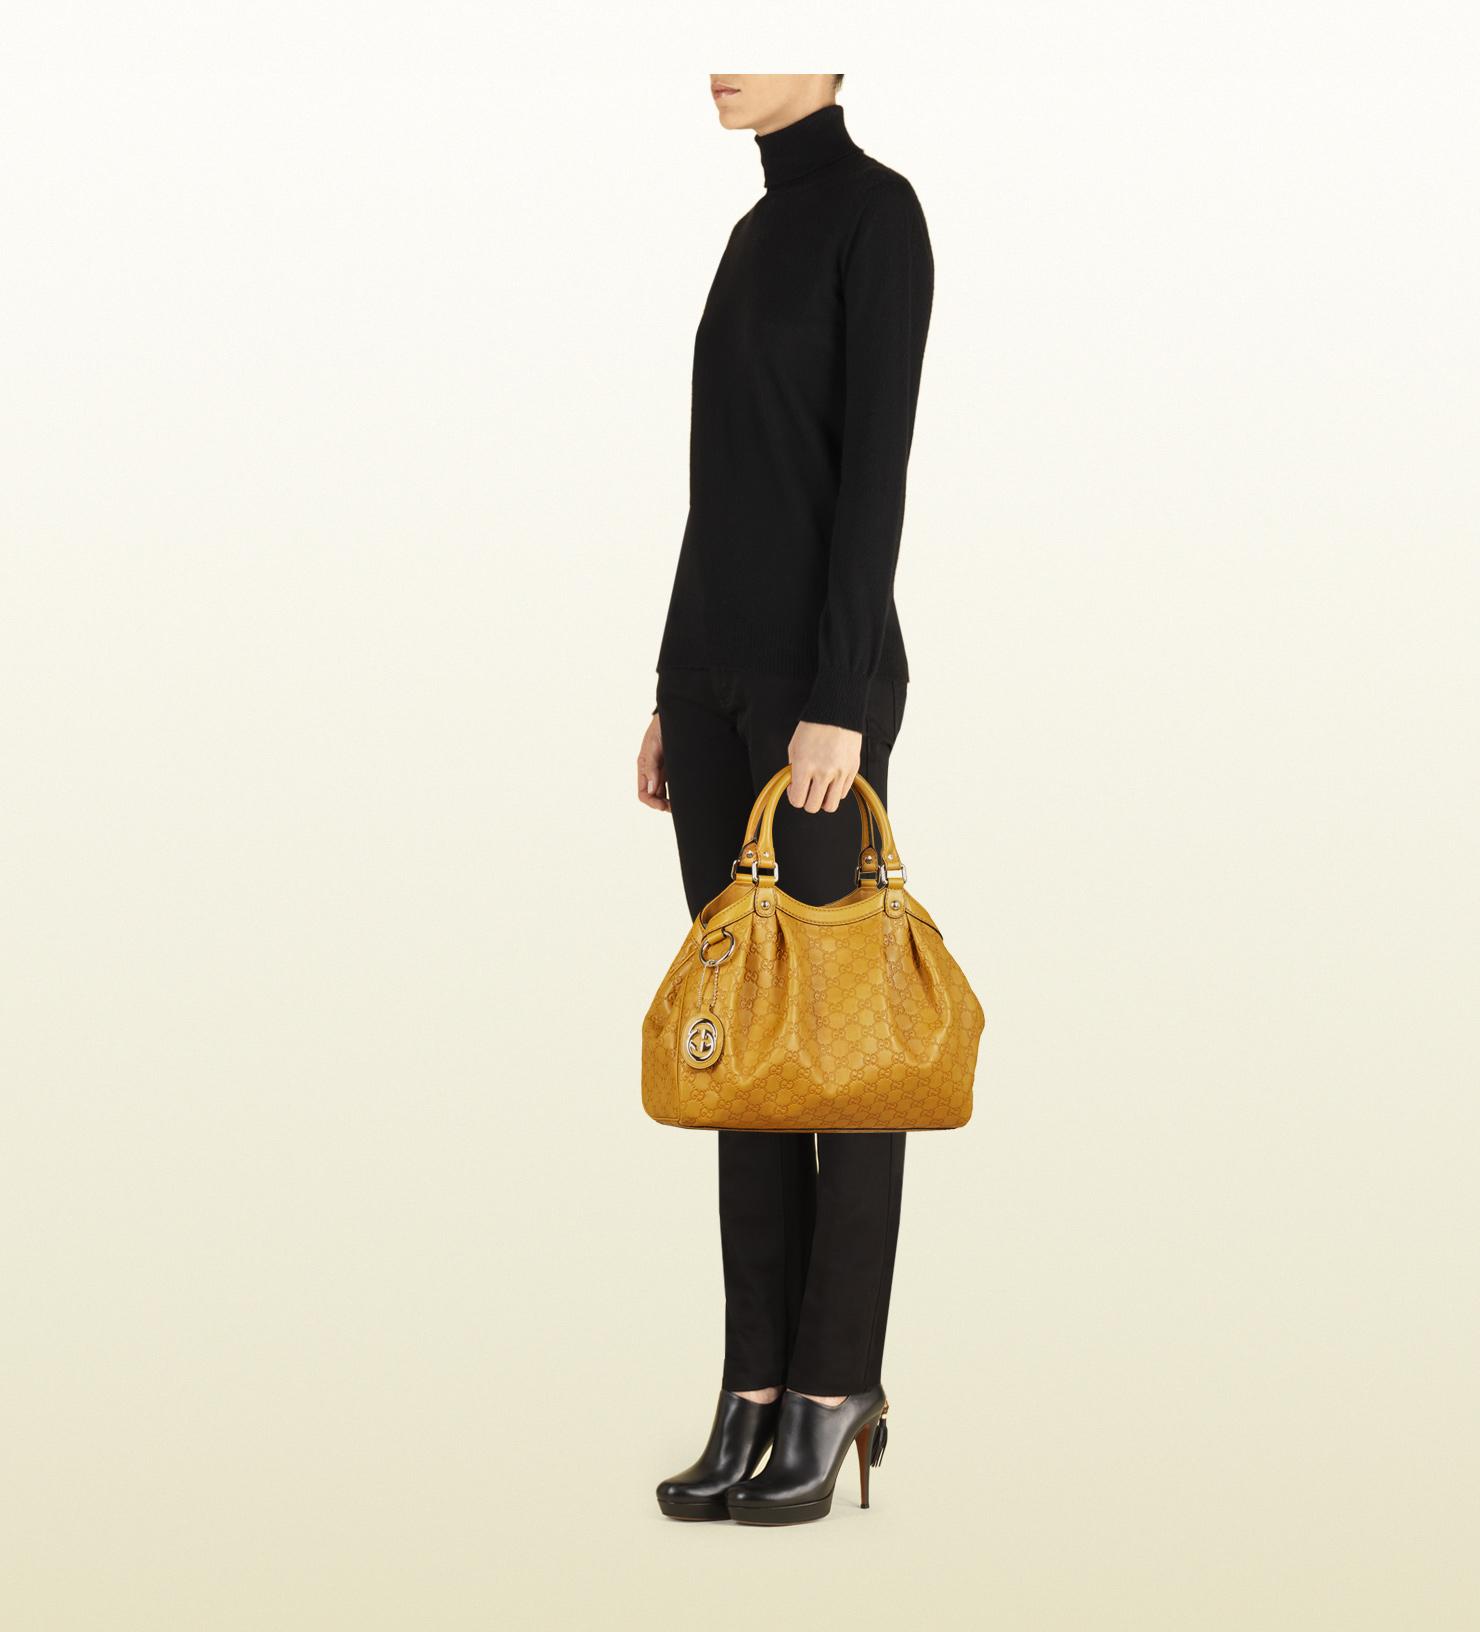 gucci sukey large black ssima leather tote bag guccissima Source · Lyst Gucci  Sukey Guccissima Tote in Yellow 4e669b736ed25